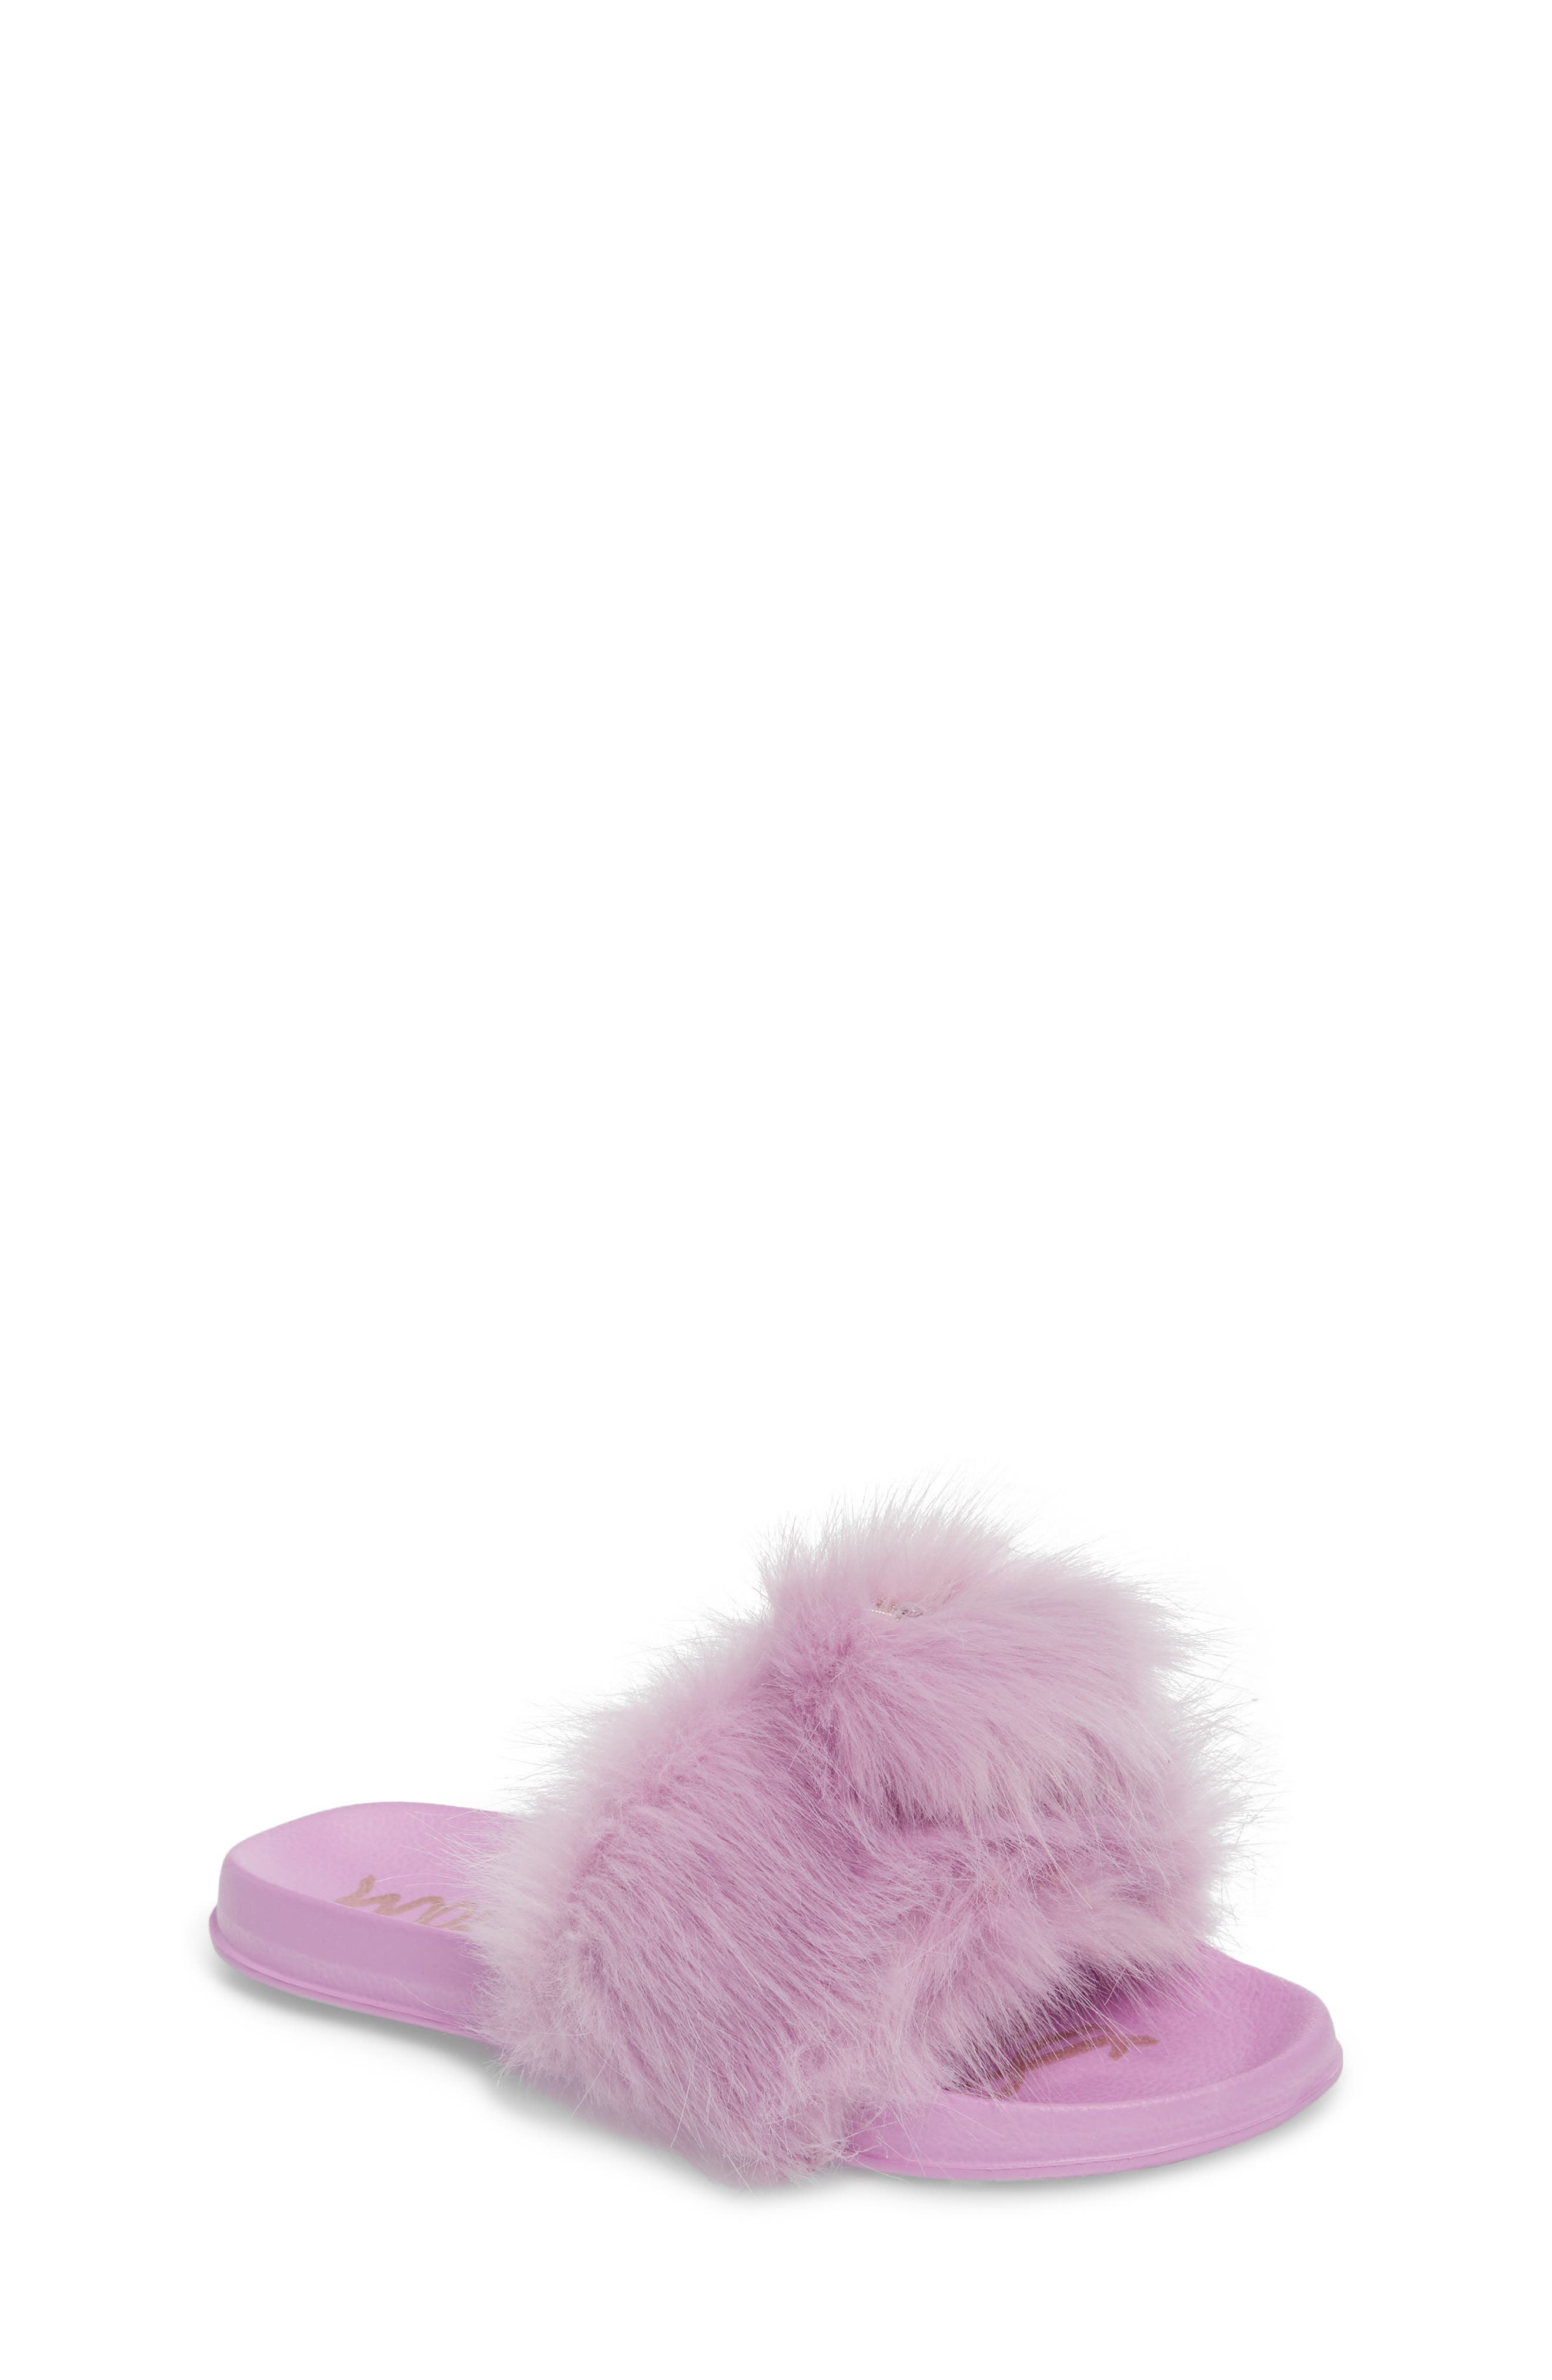 Mackie Aster Faux Fur Slide Sandal,                             Main thumbnail 1, color,                             510